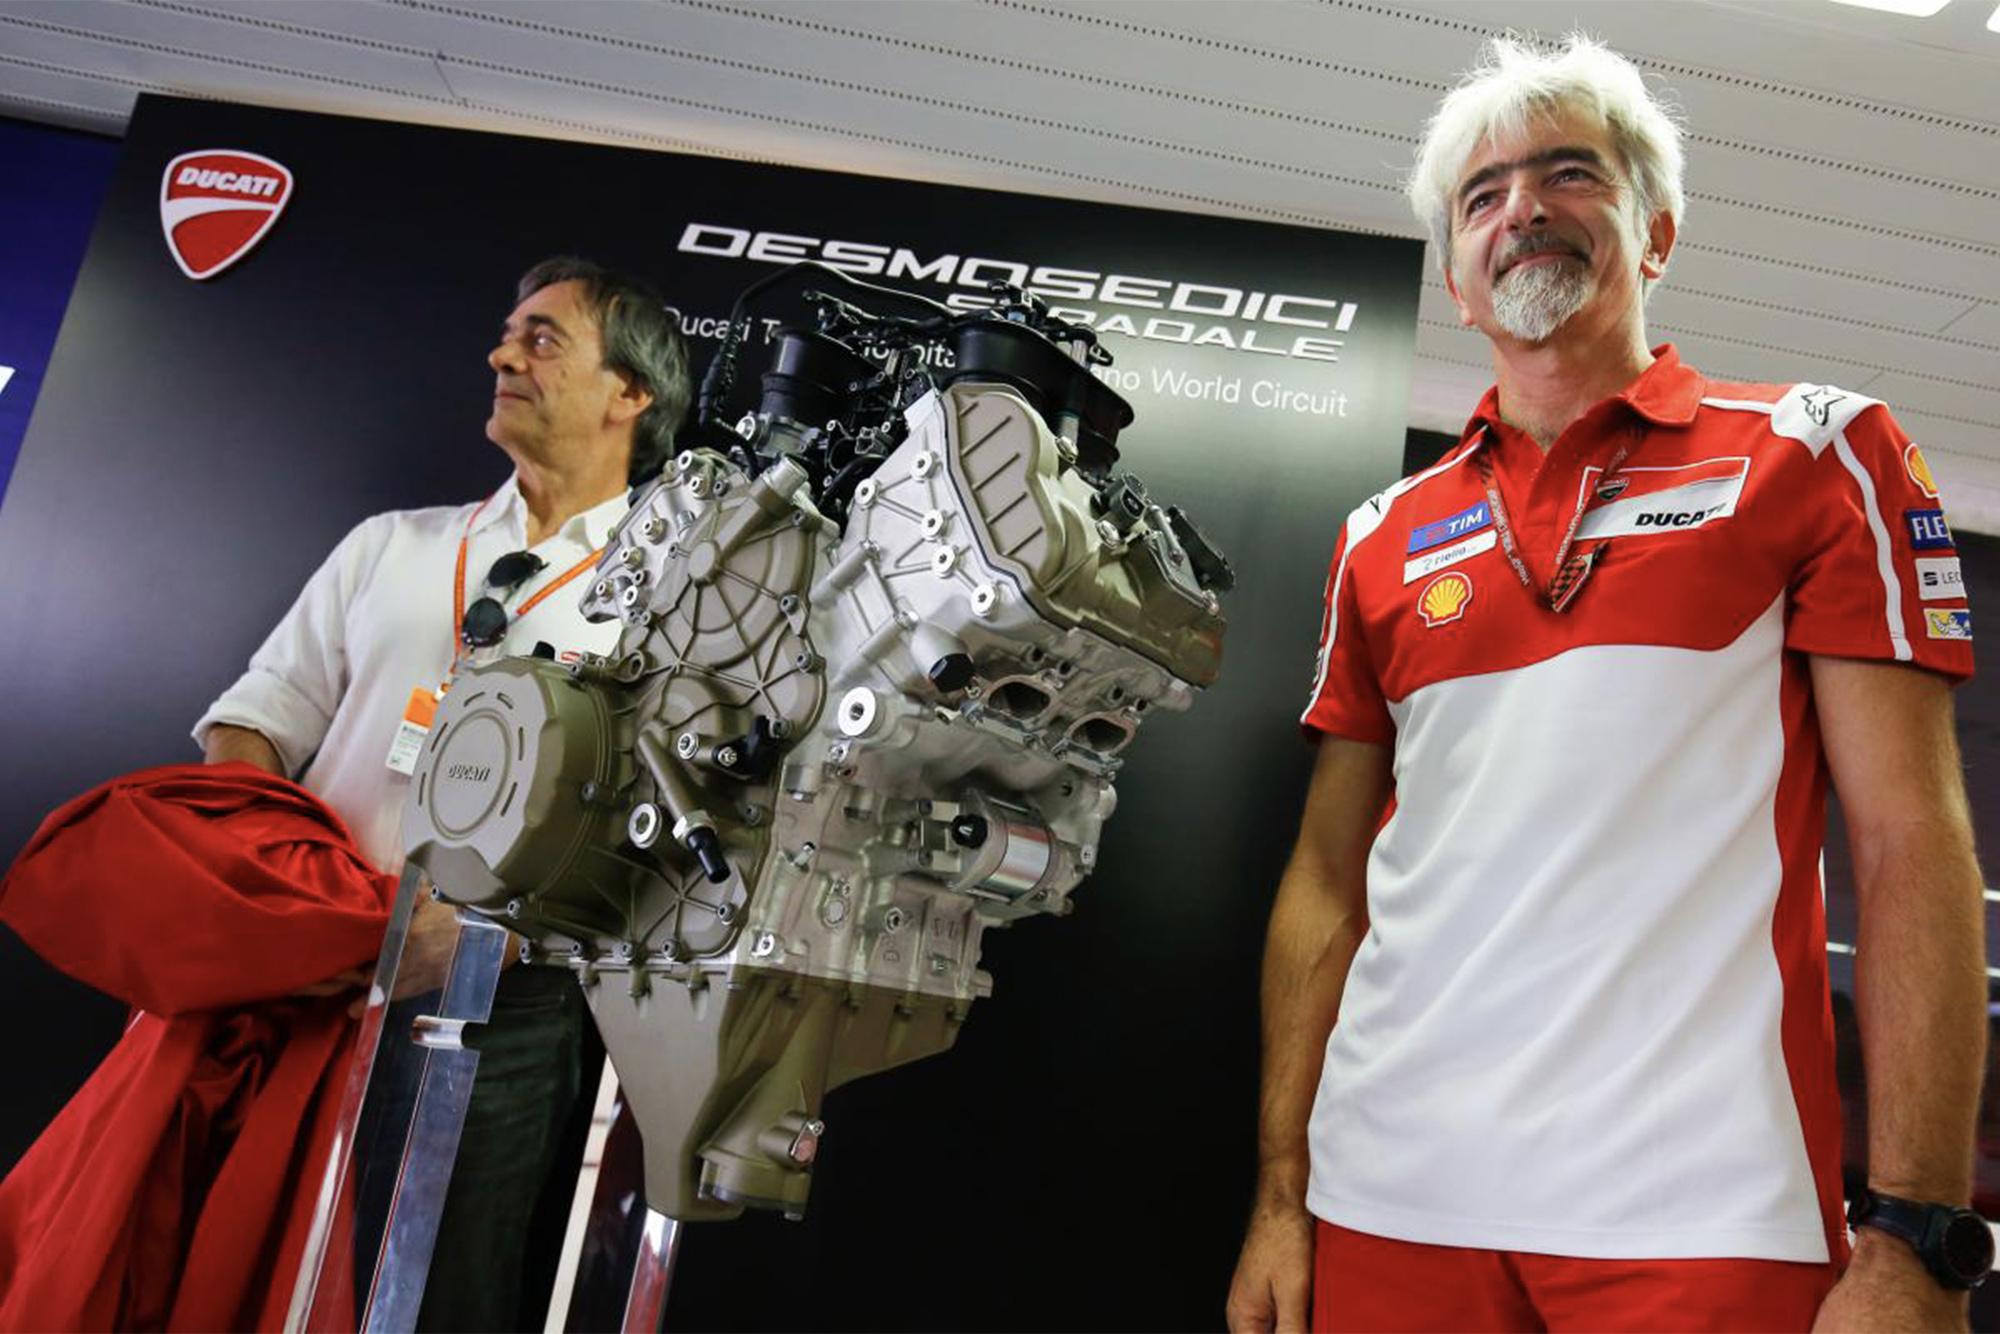 Gigi Dall'Igna with Ducati's V4 engine